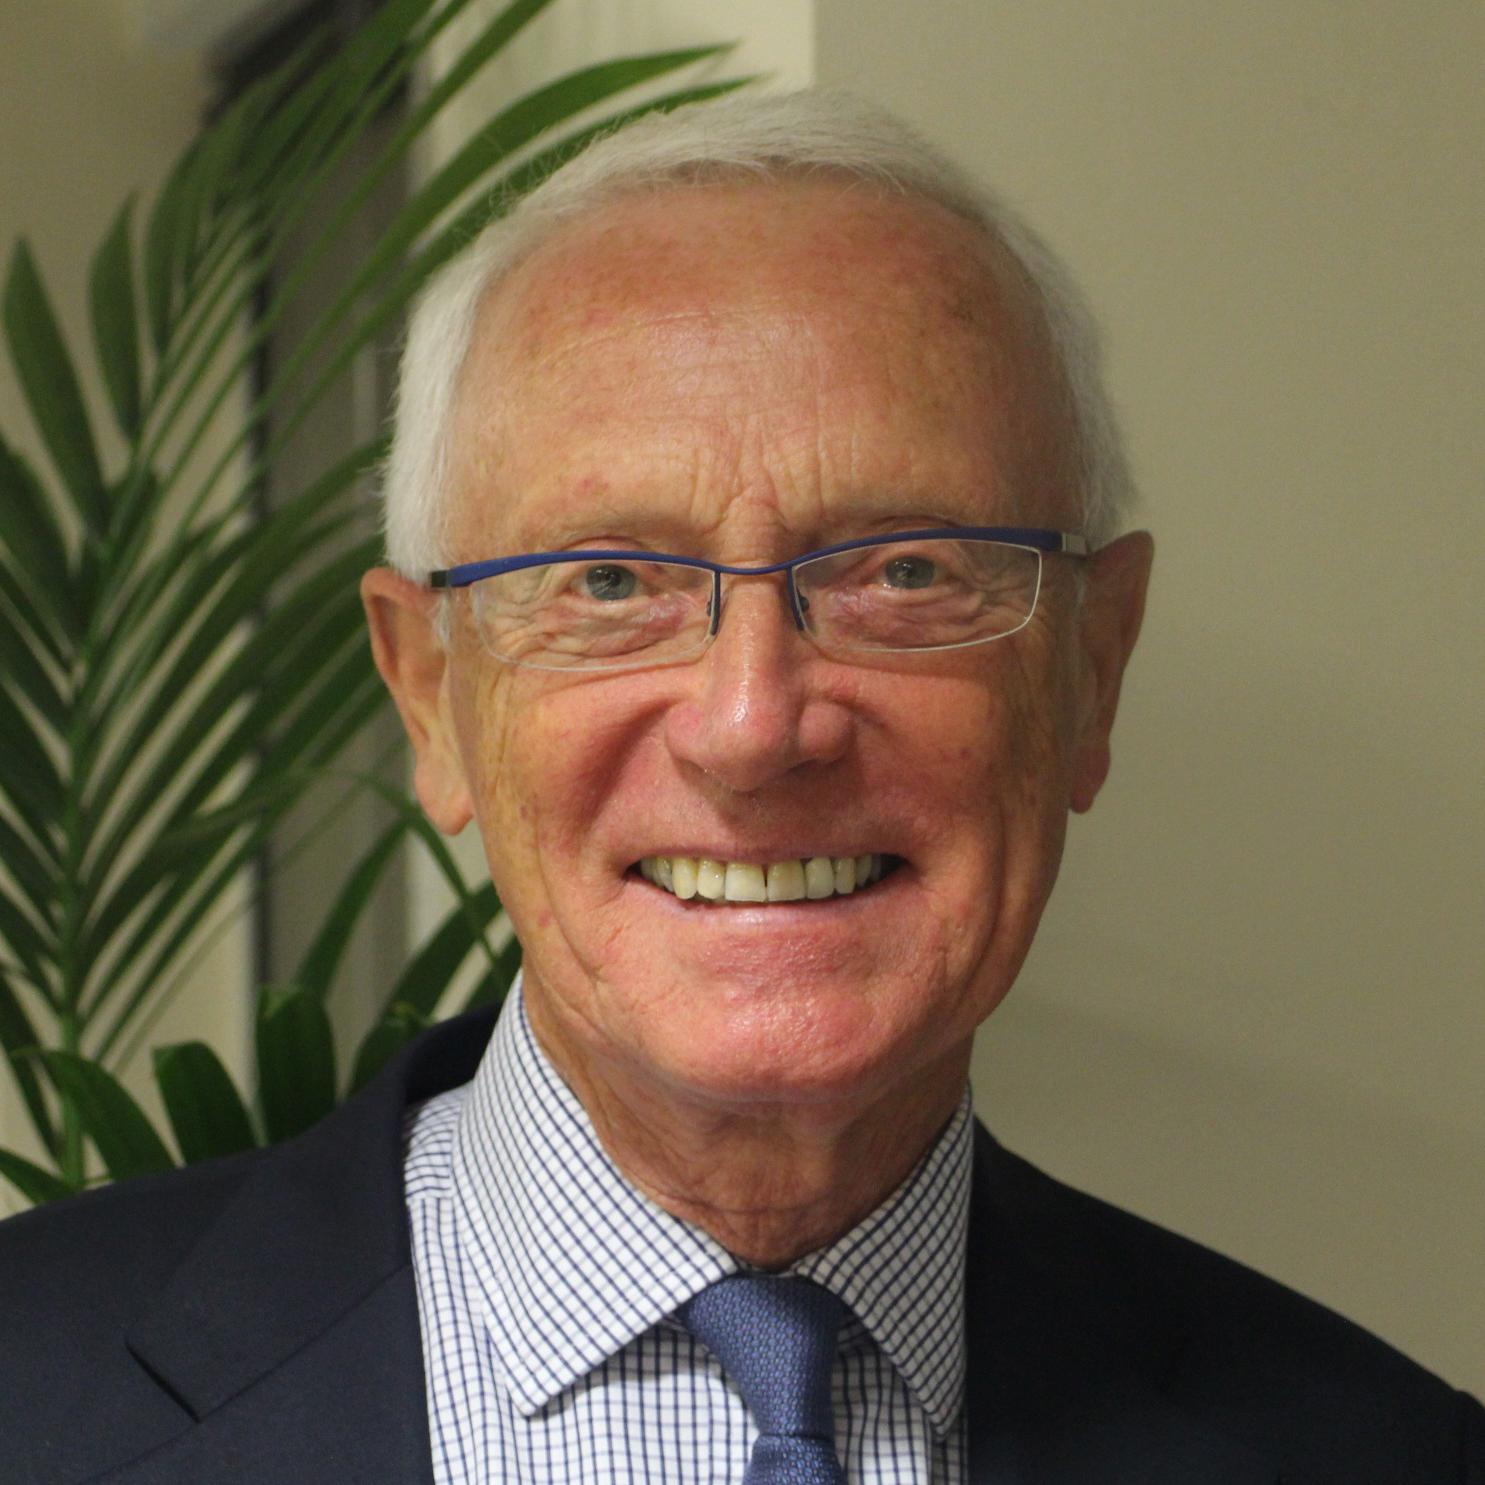 Lord Filkin CBE - Chair, APPG for Longevity, Strategic Advisory GroupRead Biography